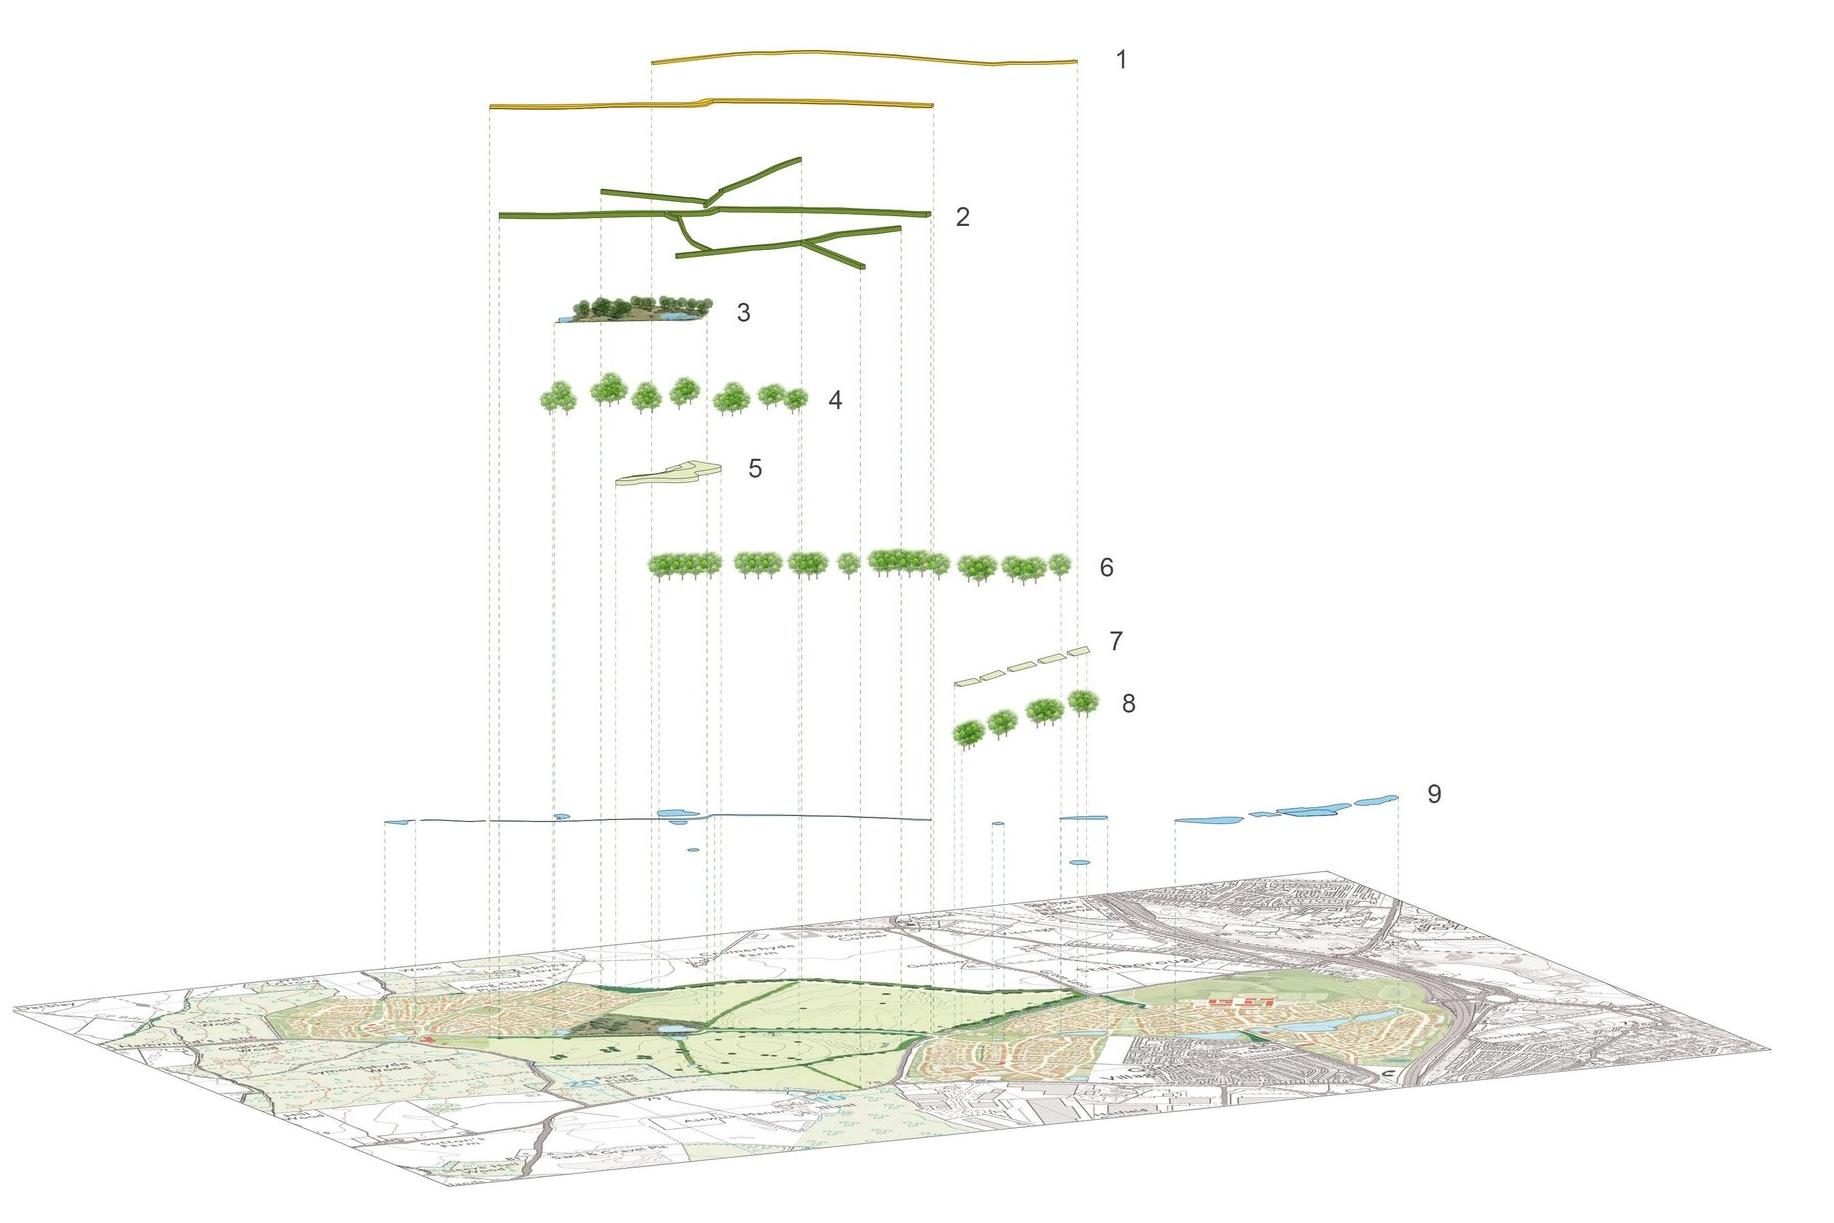 1041 Symondshyde Image 3.jpg